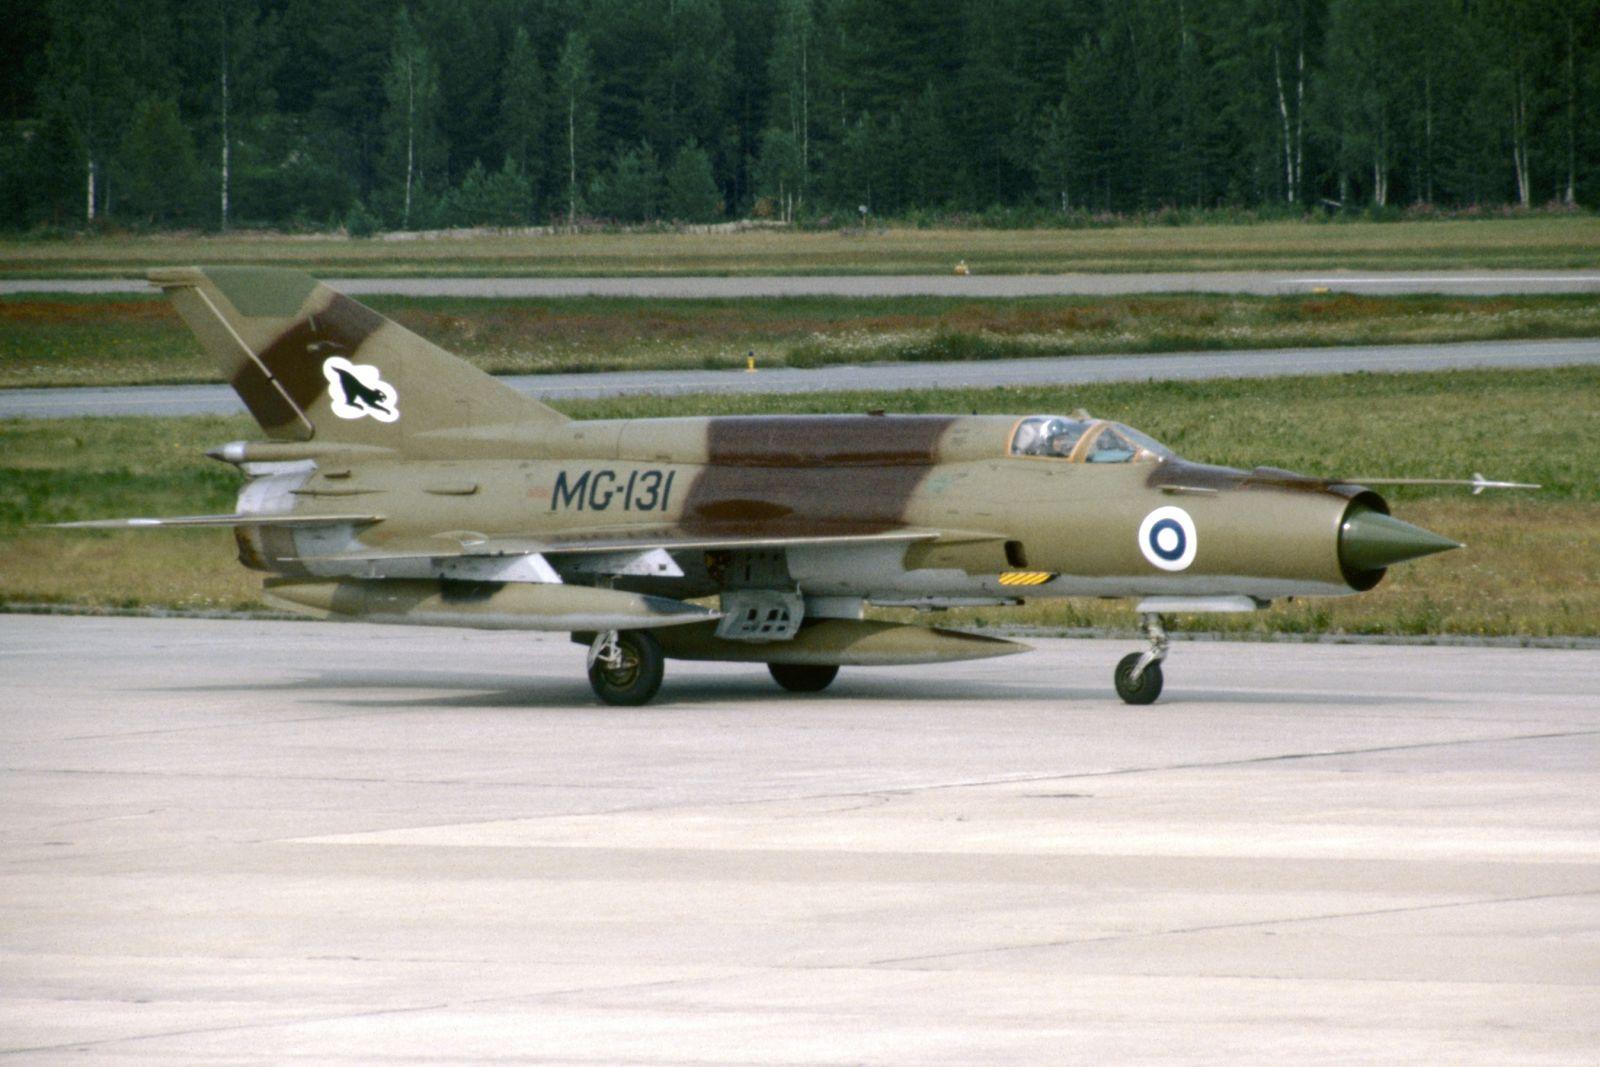 MiG-21 BIS MG-131 EFKU 1983